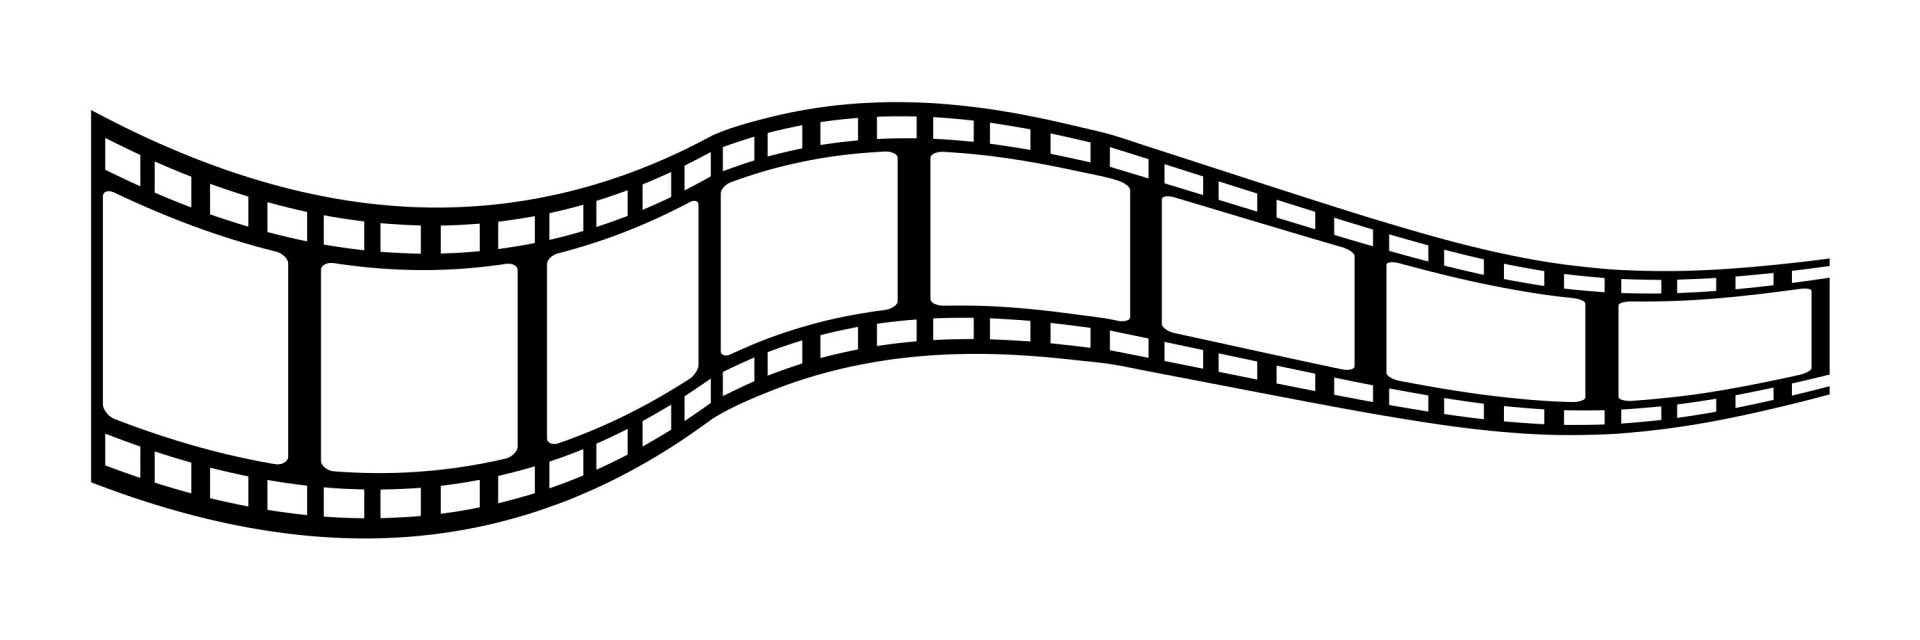 Strip free stock photo. Film clipart